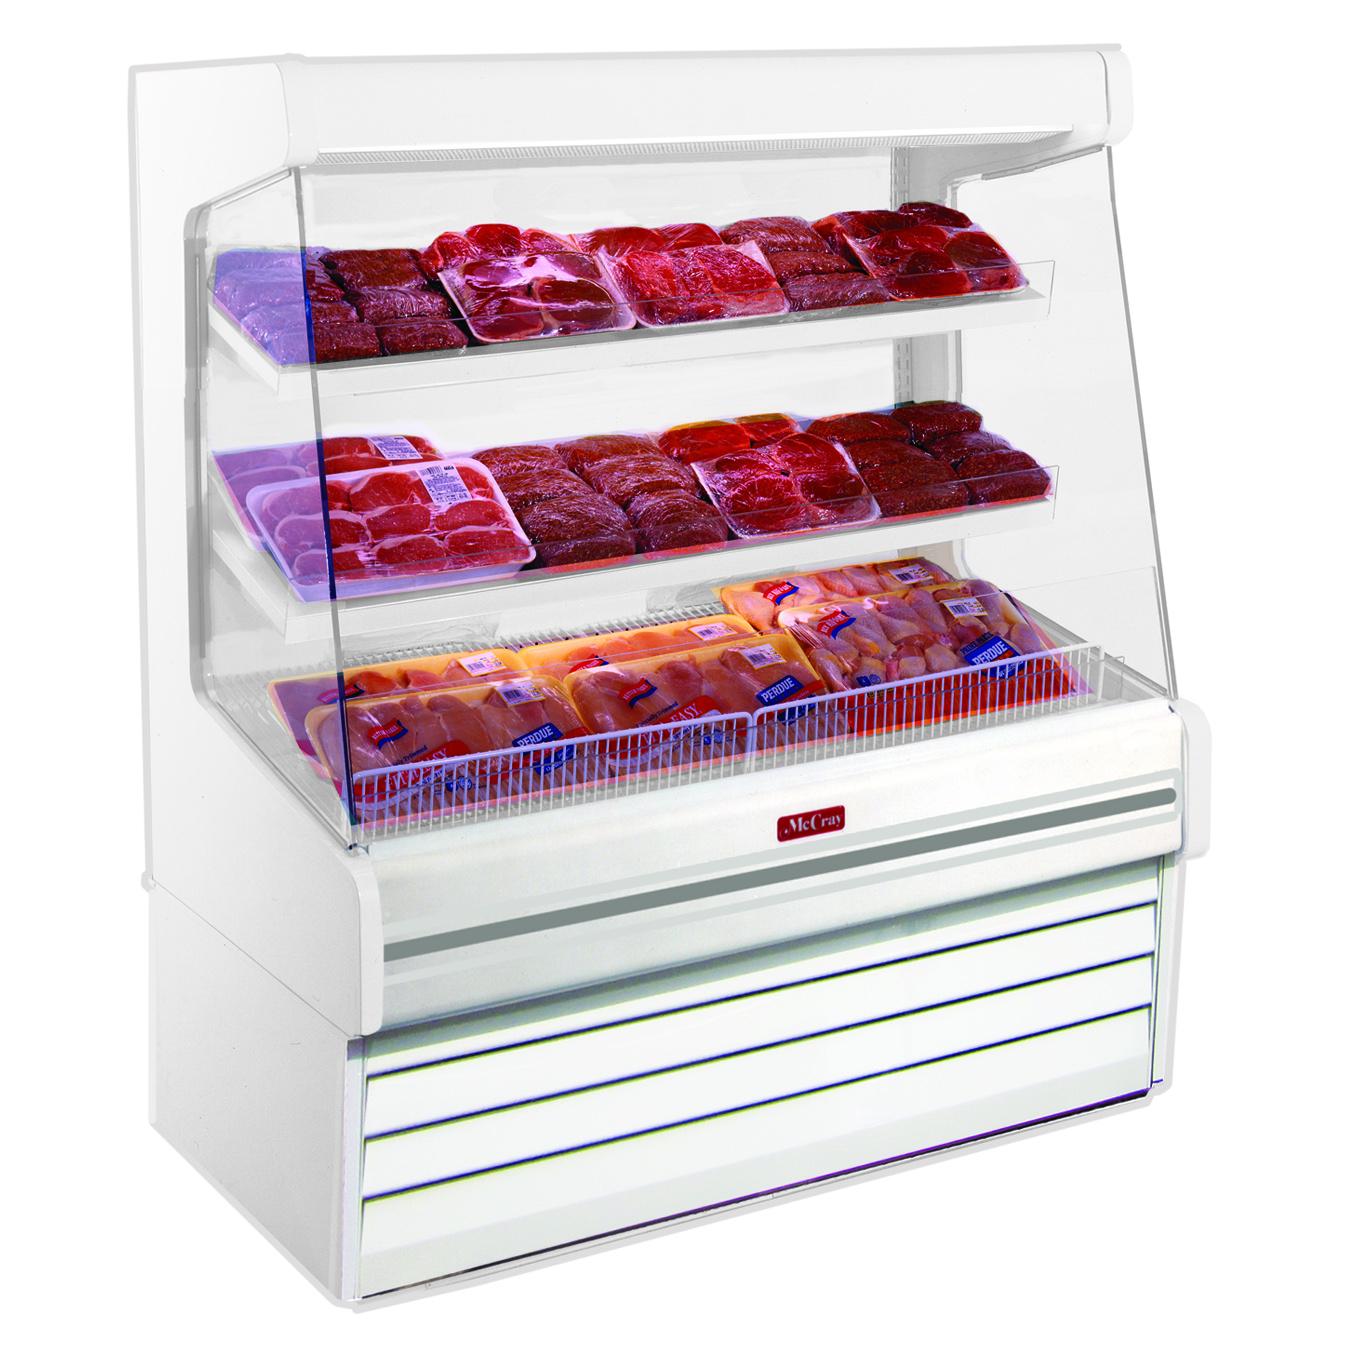 Howard-McCray SC-OP30E-8L-S-LED display case, produce